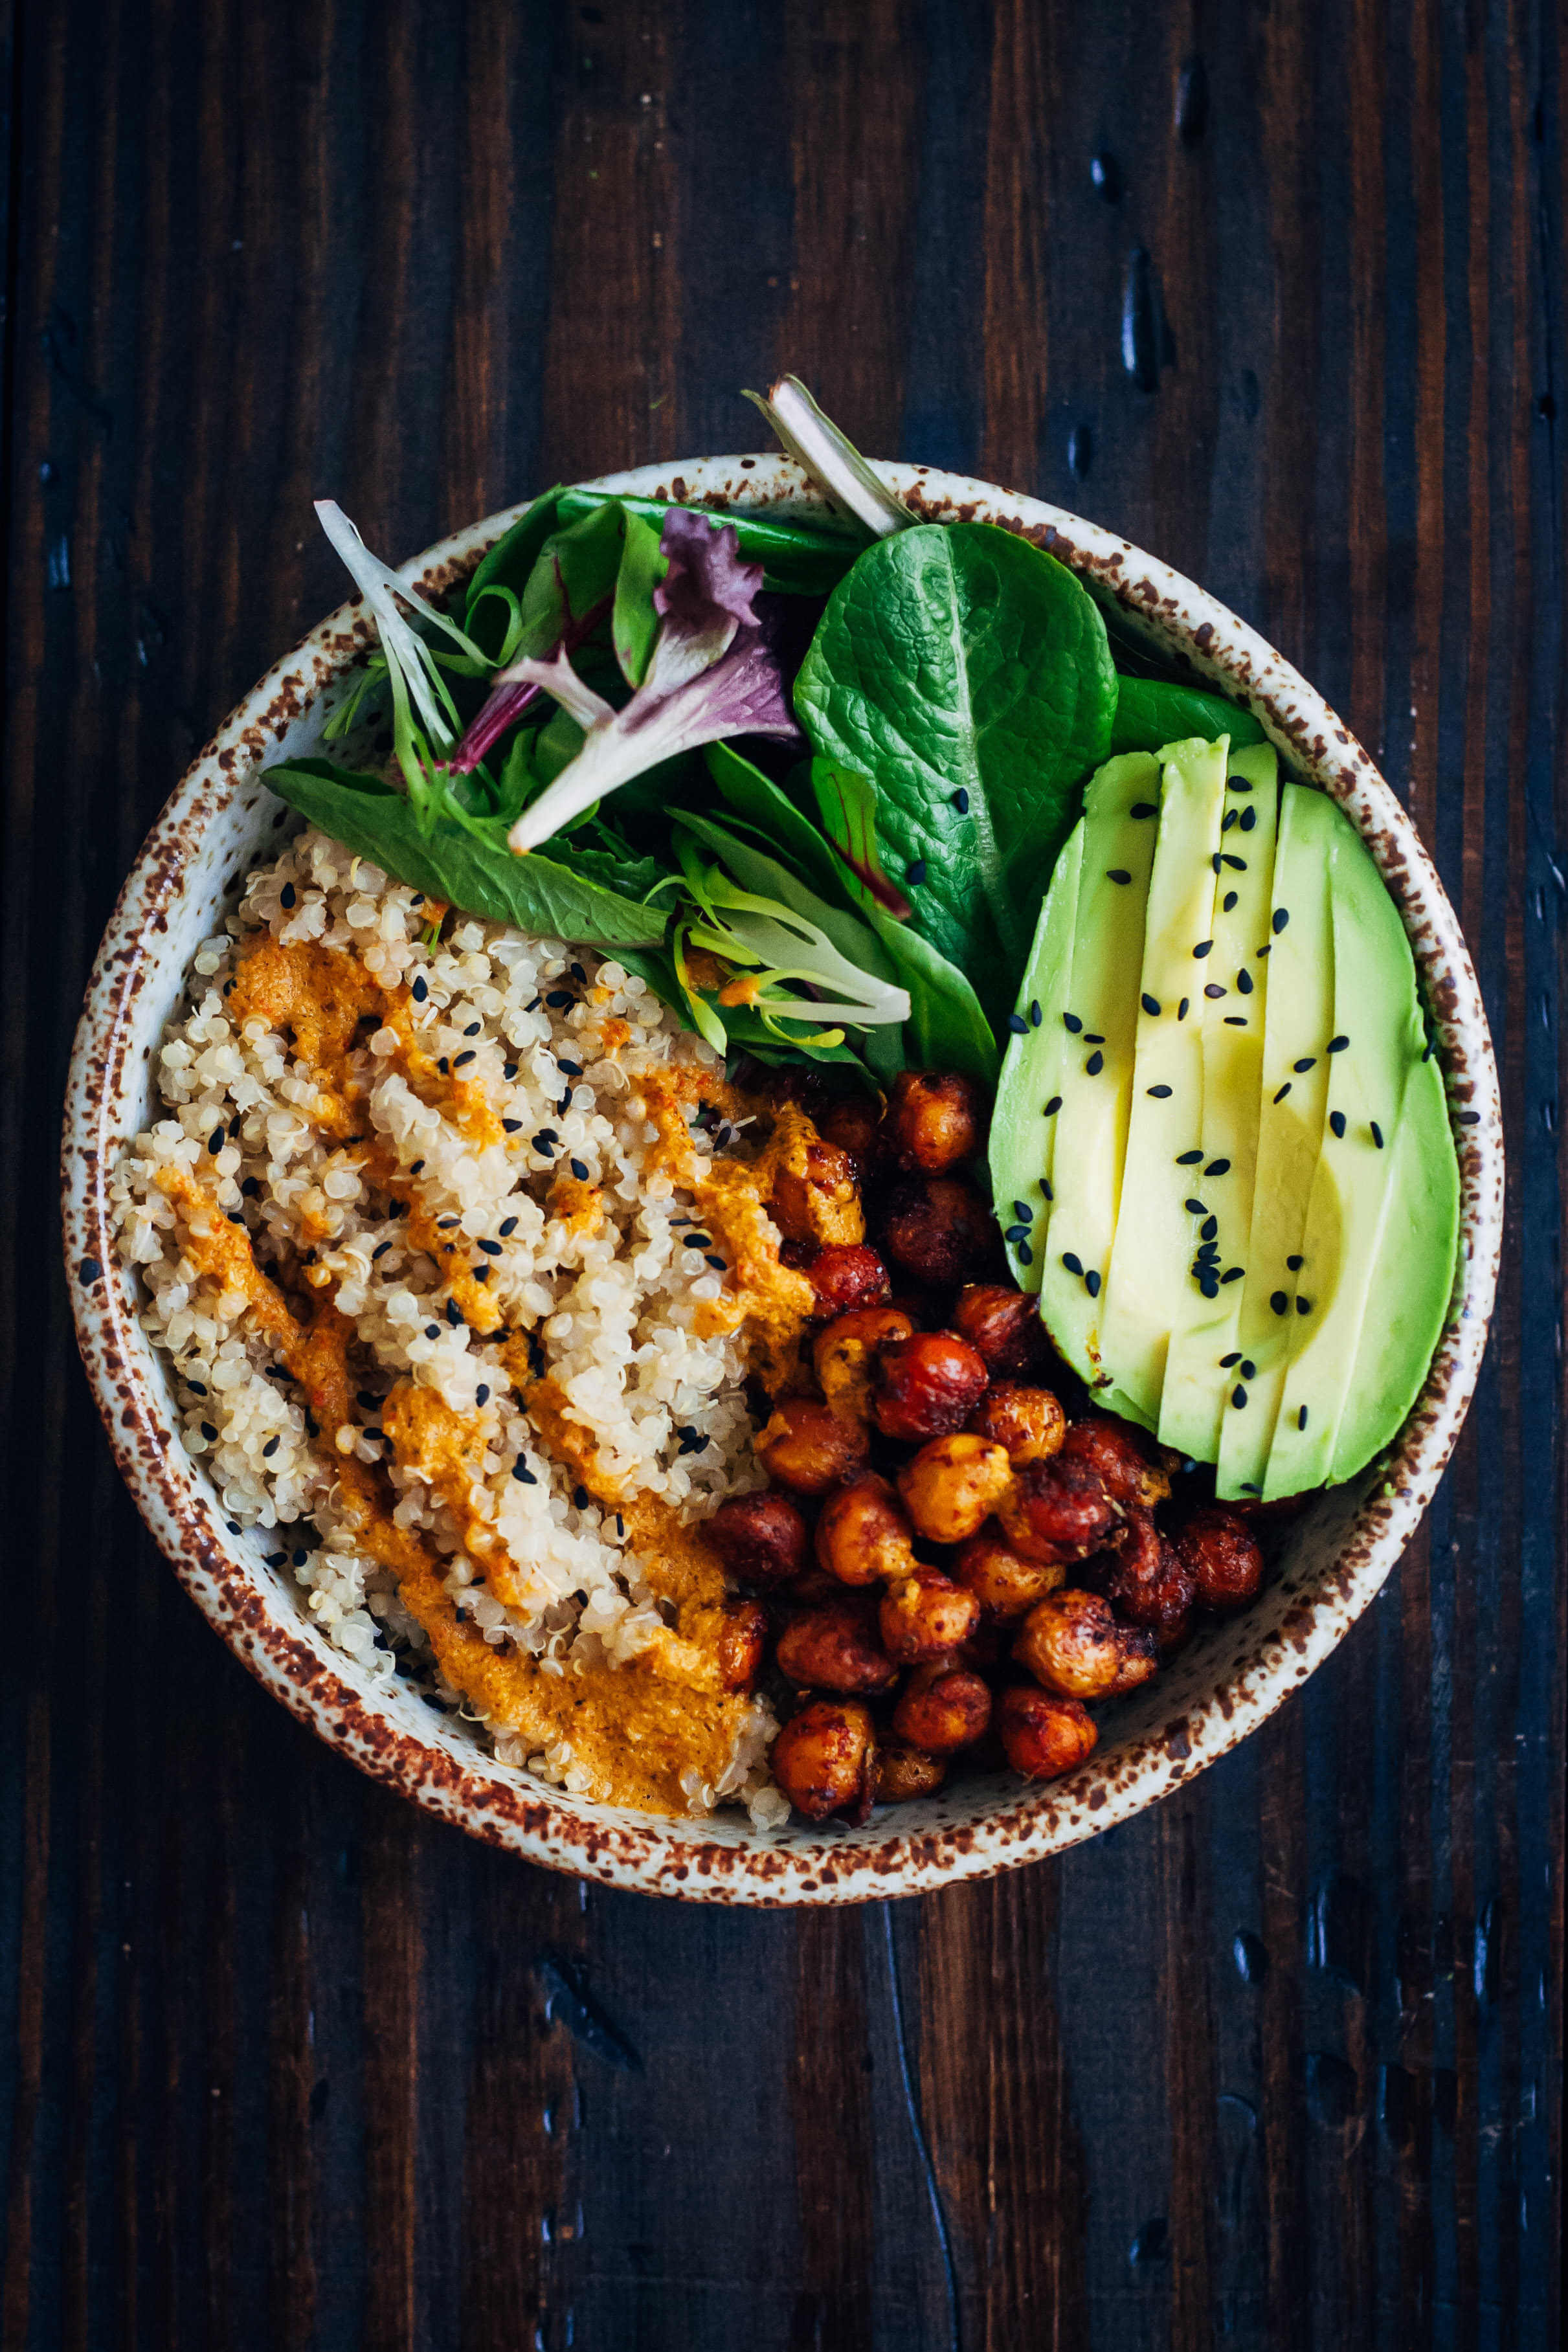 Vegan Recipes Healthy  25 Vegan Dinner Recipes Easy Healthy Plant based